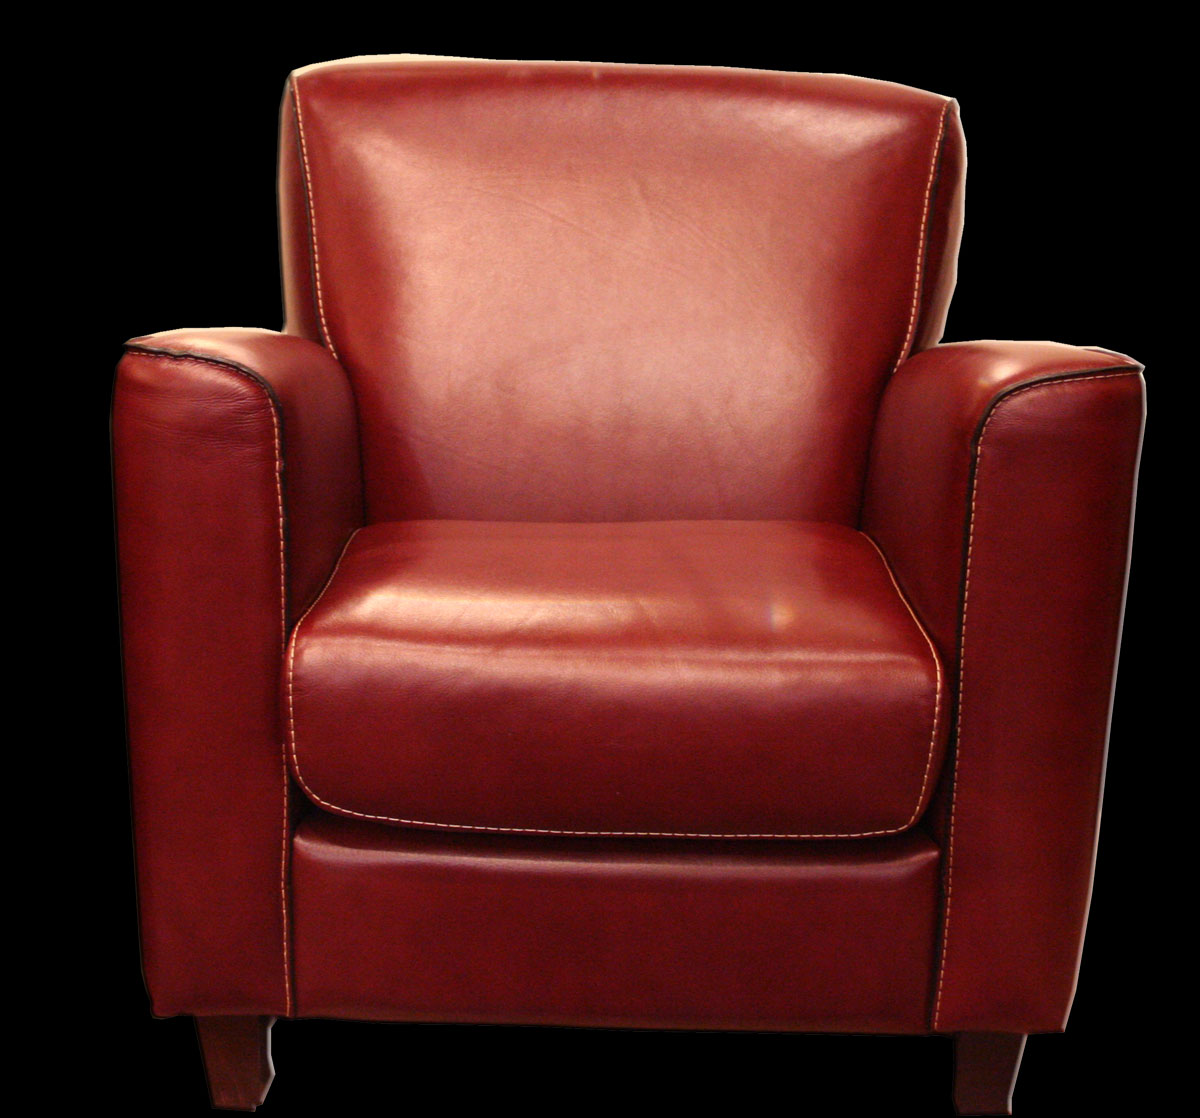 Fauteuil Maline en cuir Rouge 1205 5 €